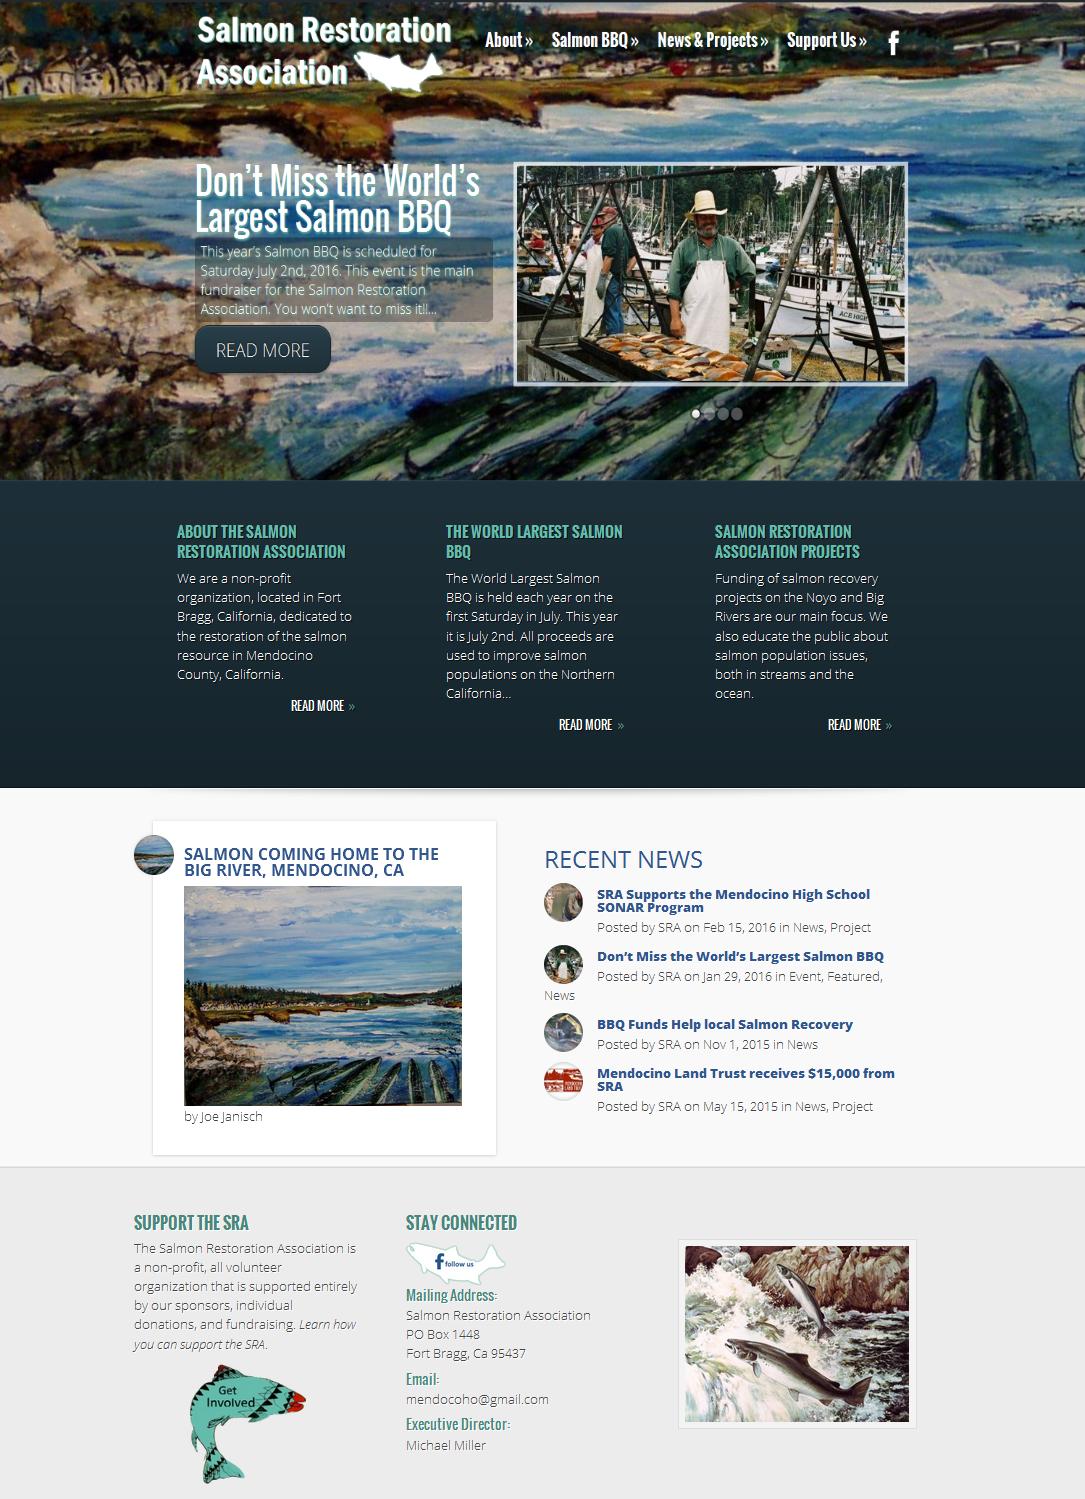 Salmon Restoration Association